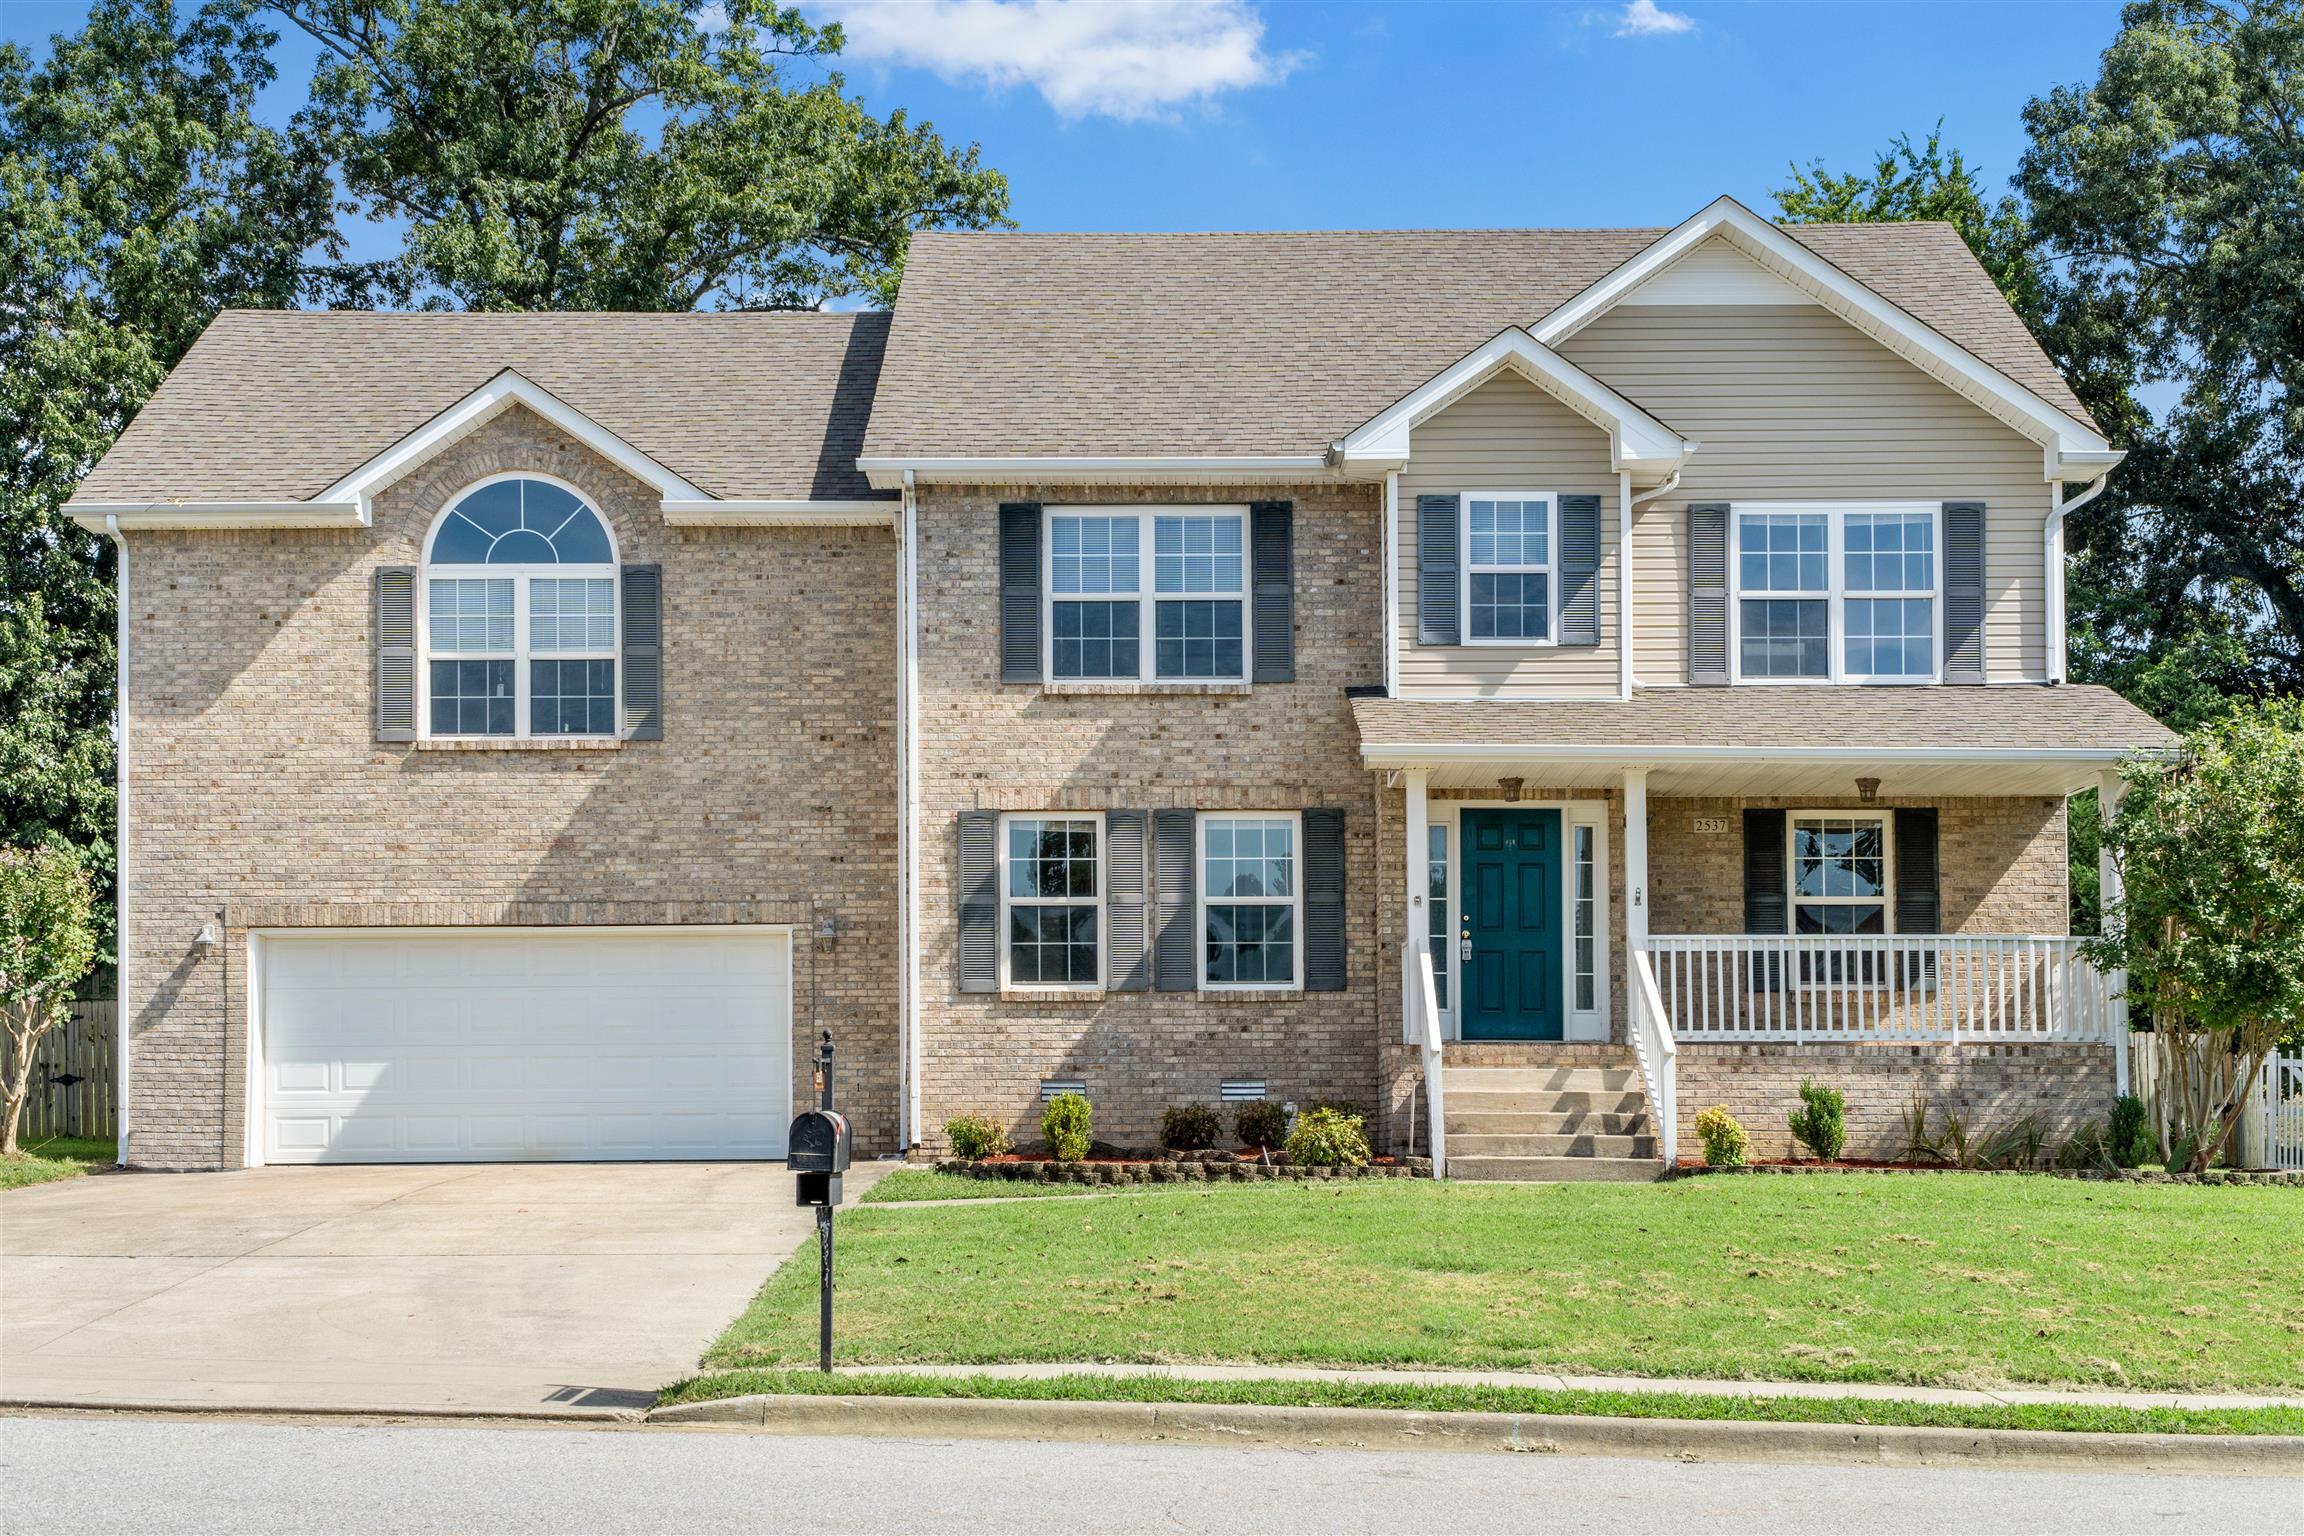 2537 Hattington Dr, Clarksville, TN 37042 - Clarksville, TN real estate listing